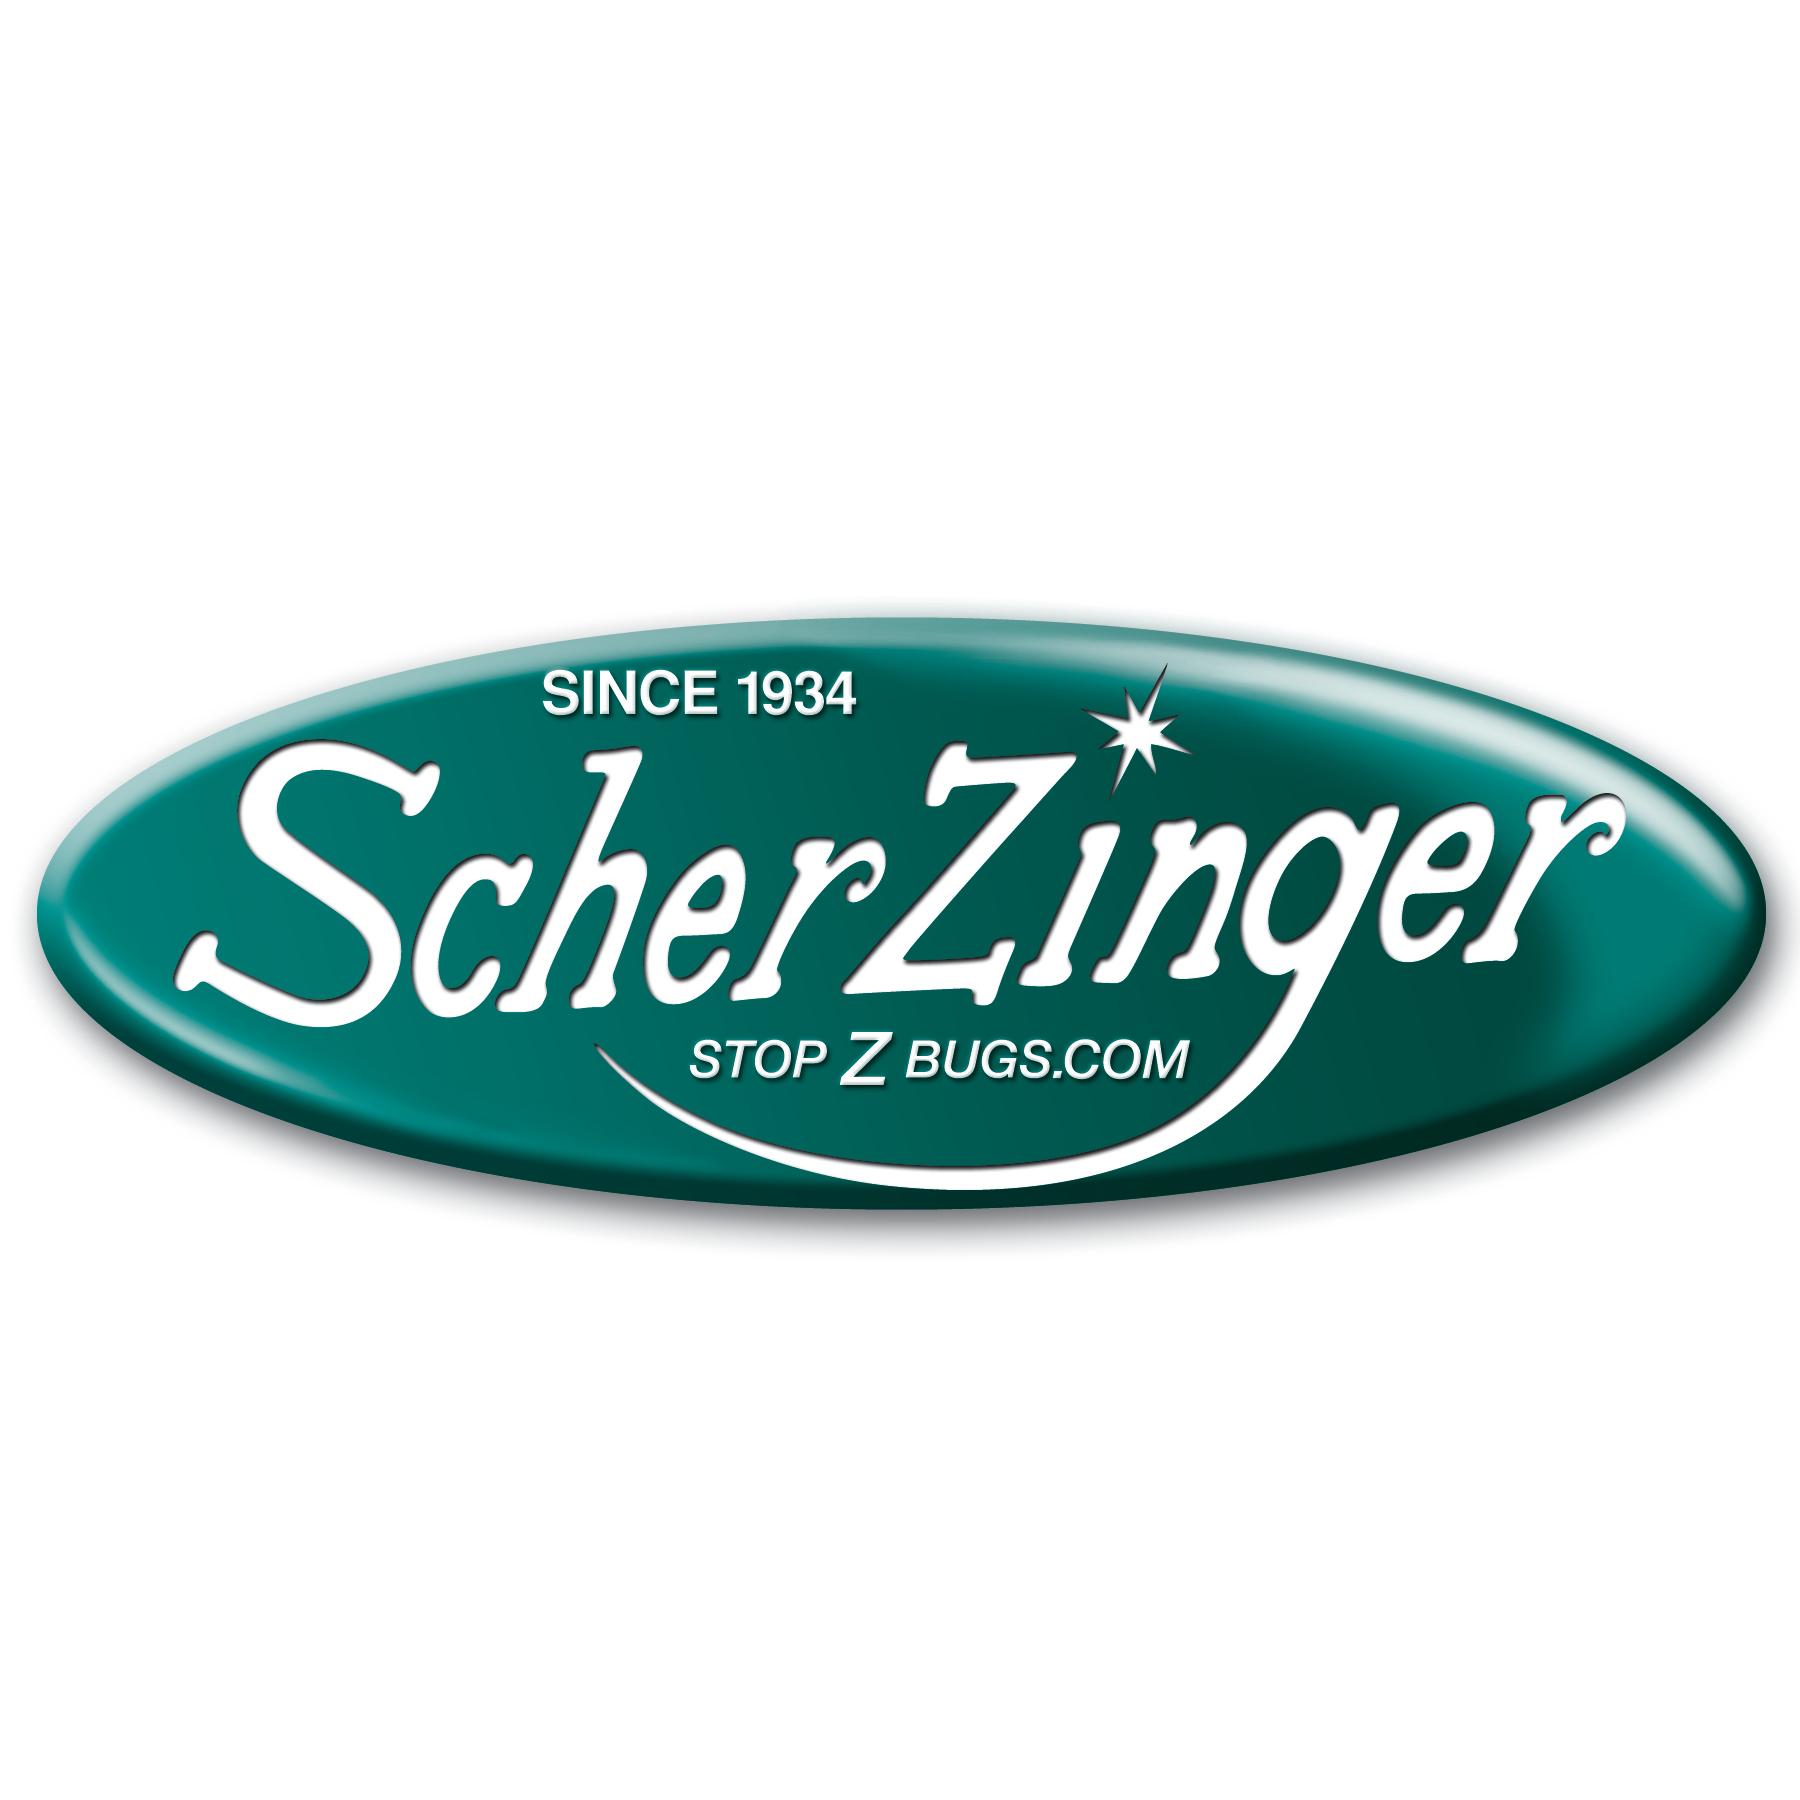 Scherzinger Pest Control image 2